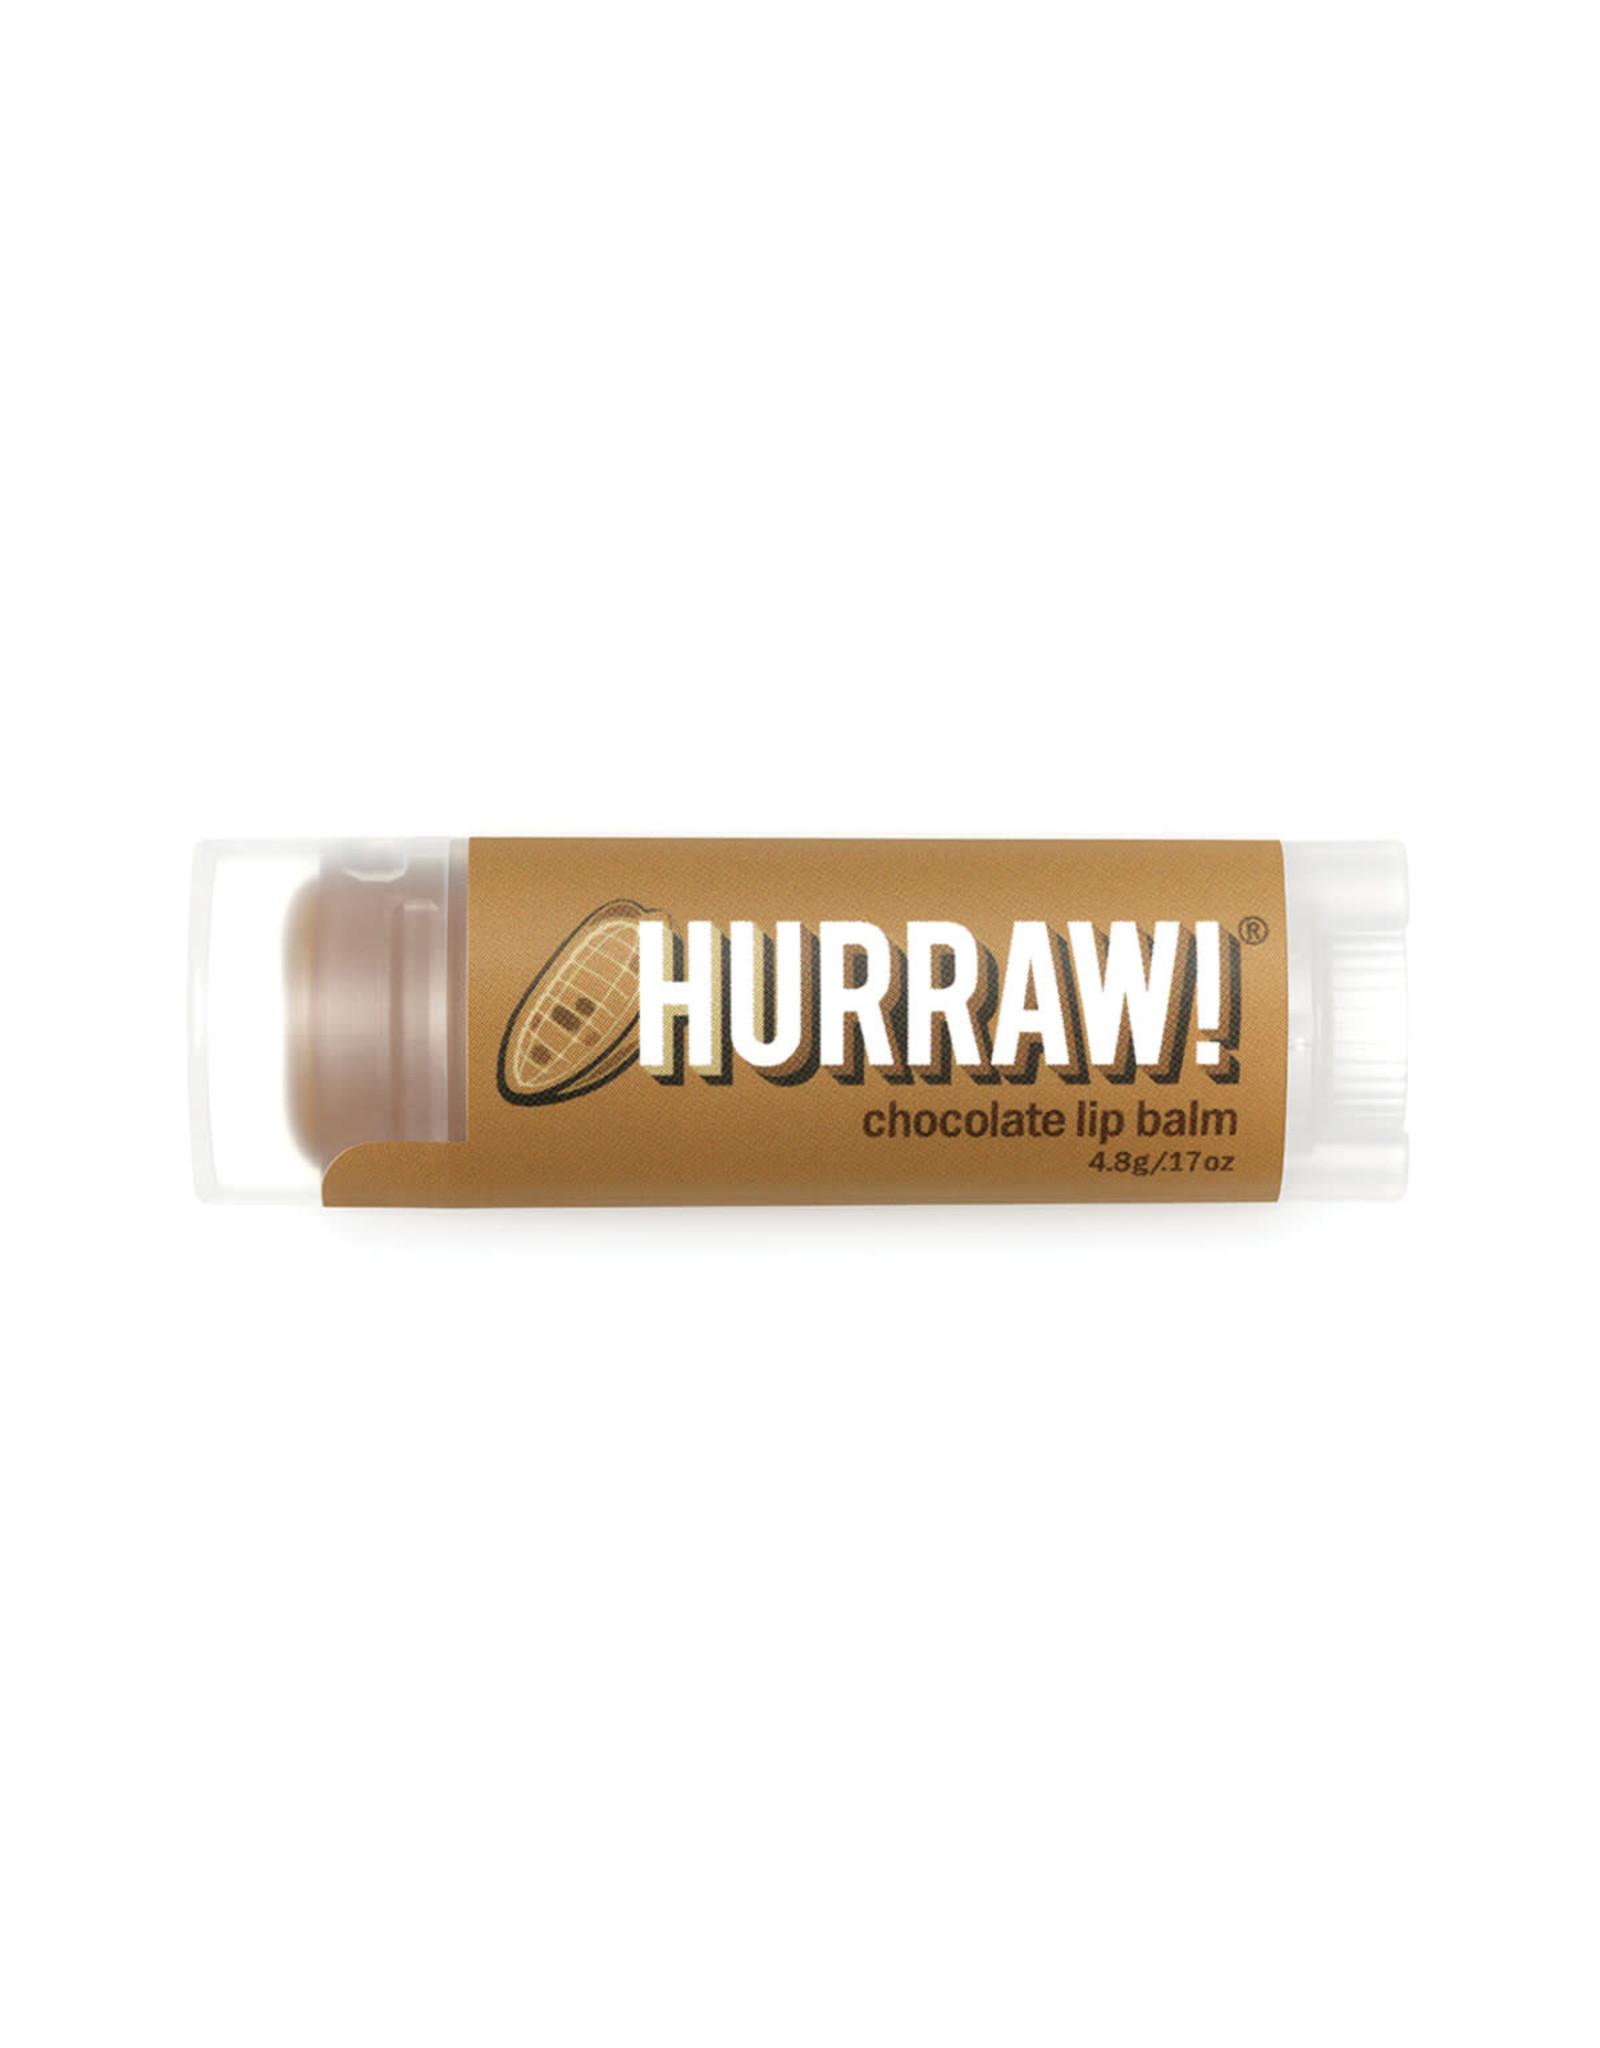 Hurraw! Lip Balm Chocolate 4.3g